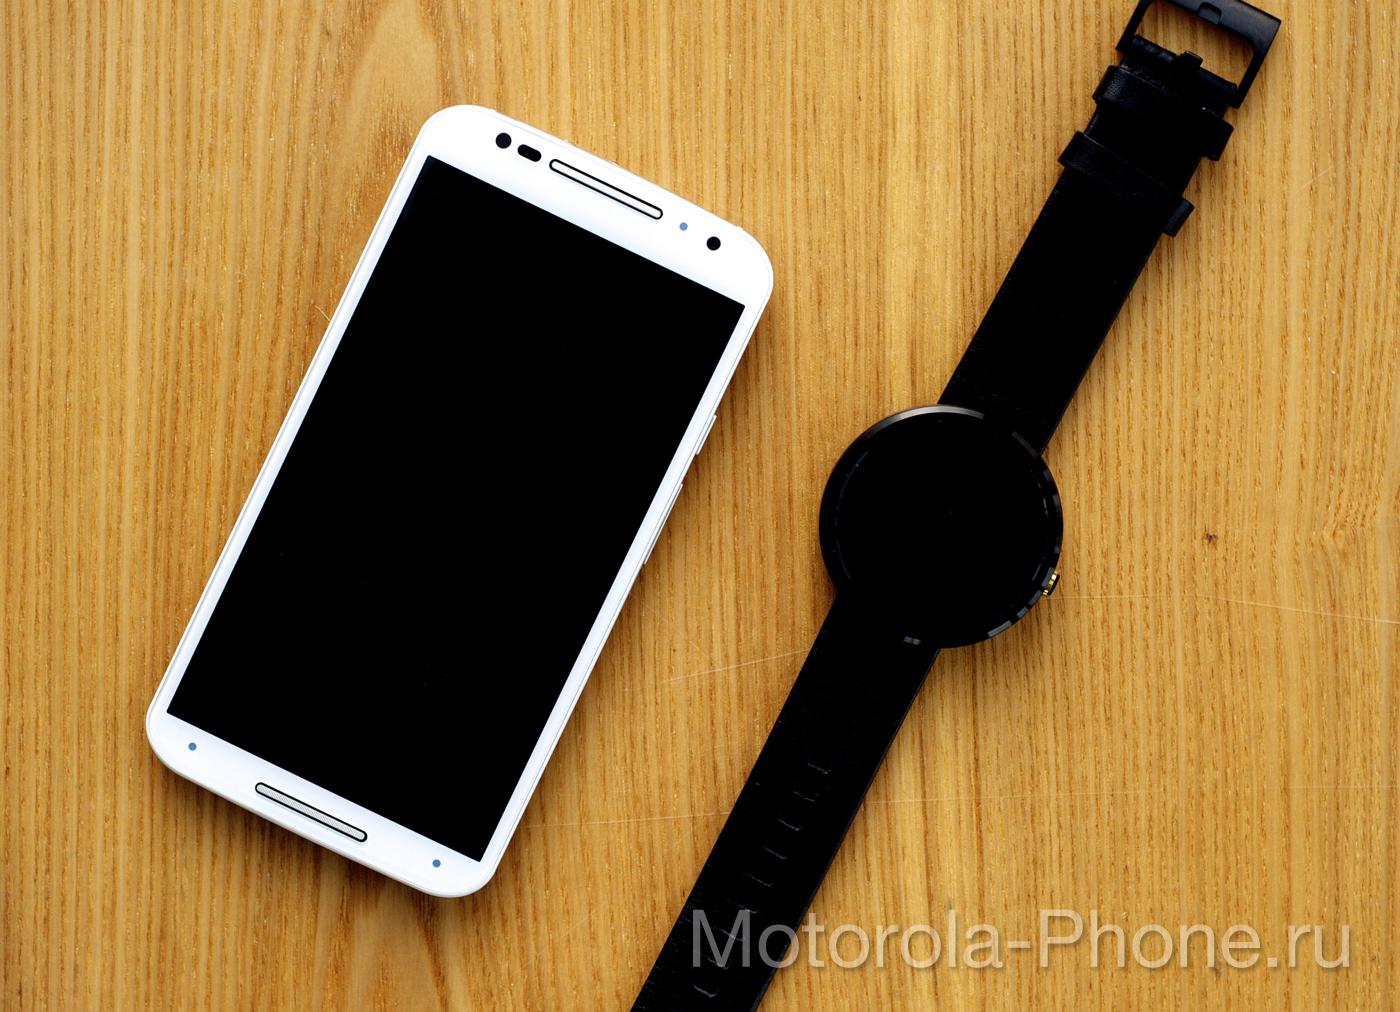 Motorola-Moto-X-Bamboo-13